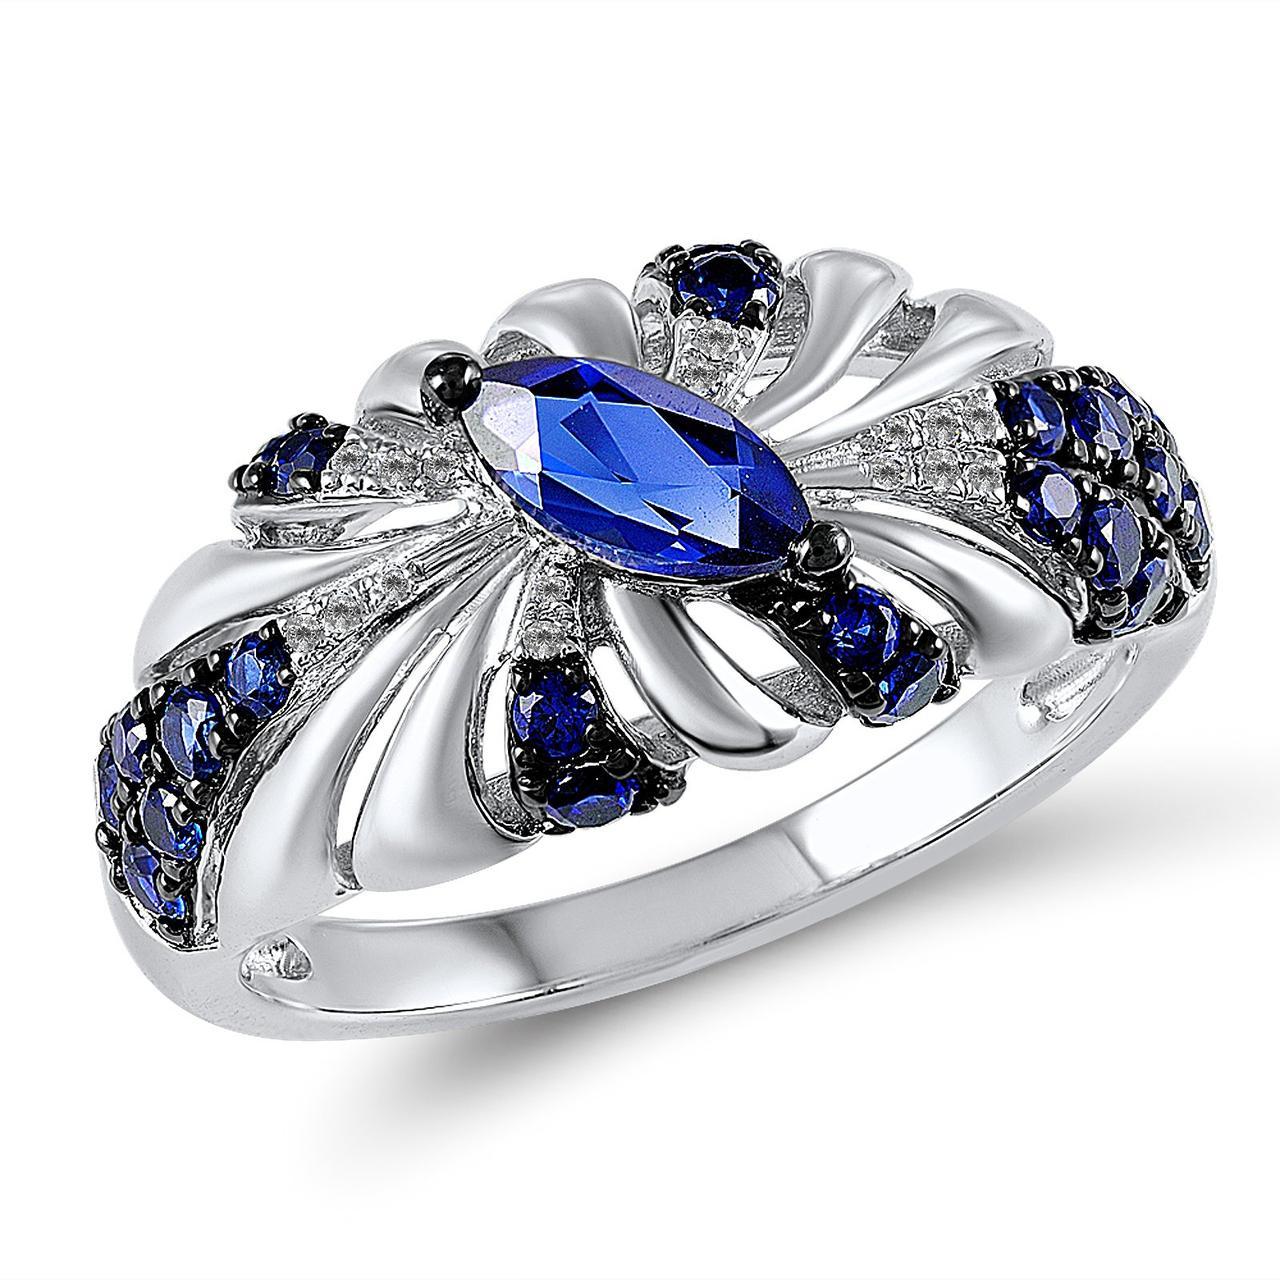 Золотое кольцо с бриллиантами и сапфирами, размер 16 (210397)